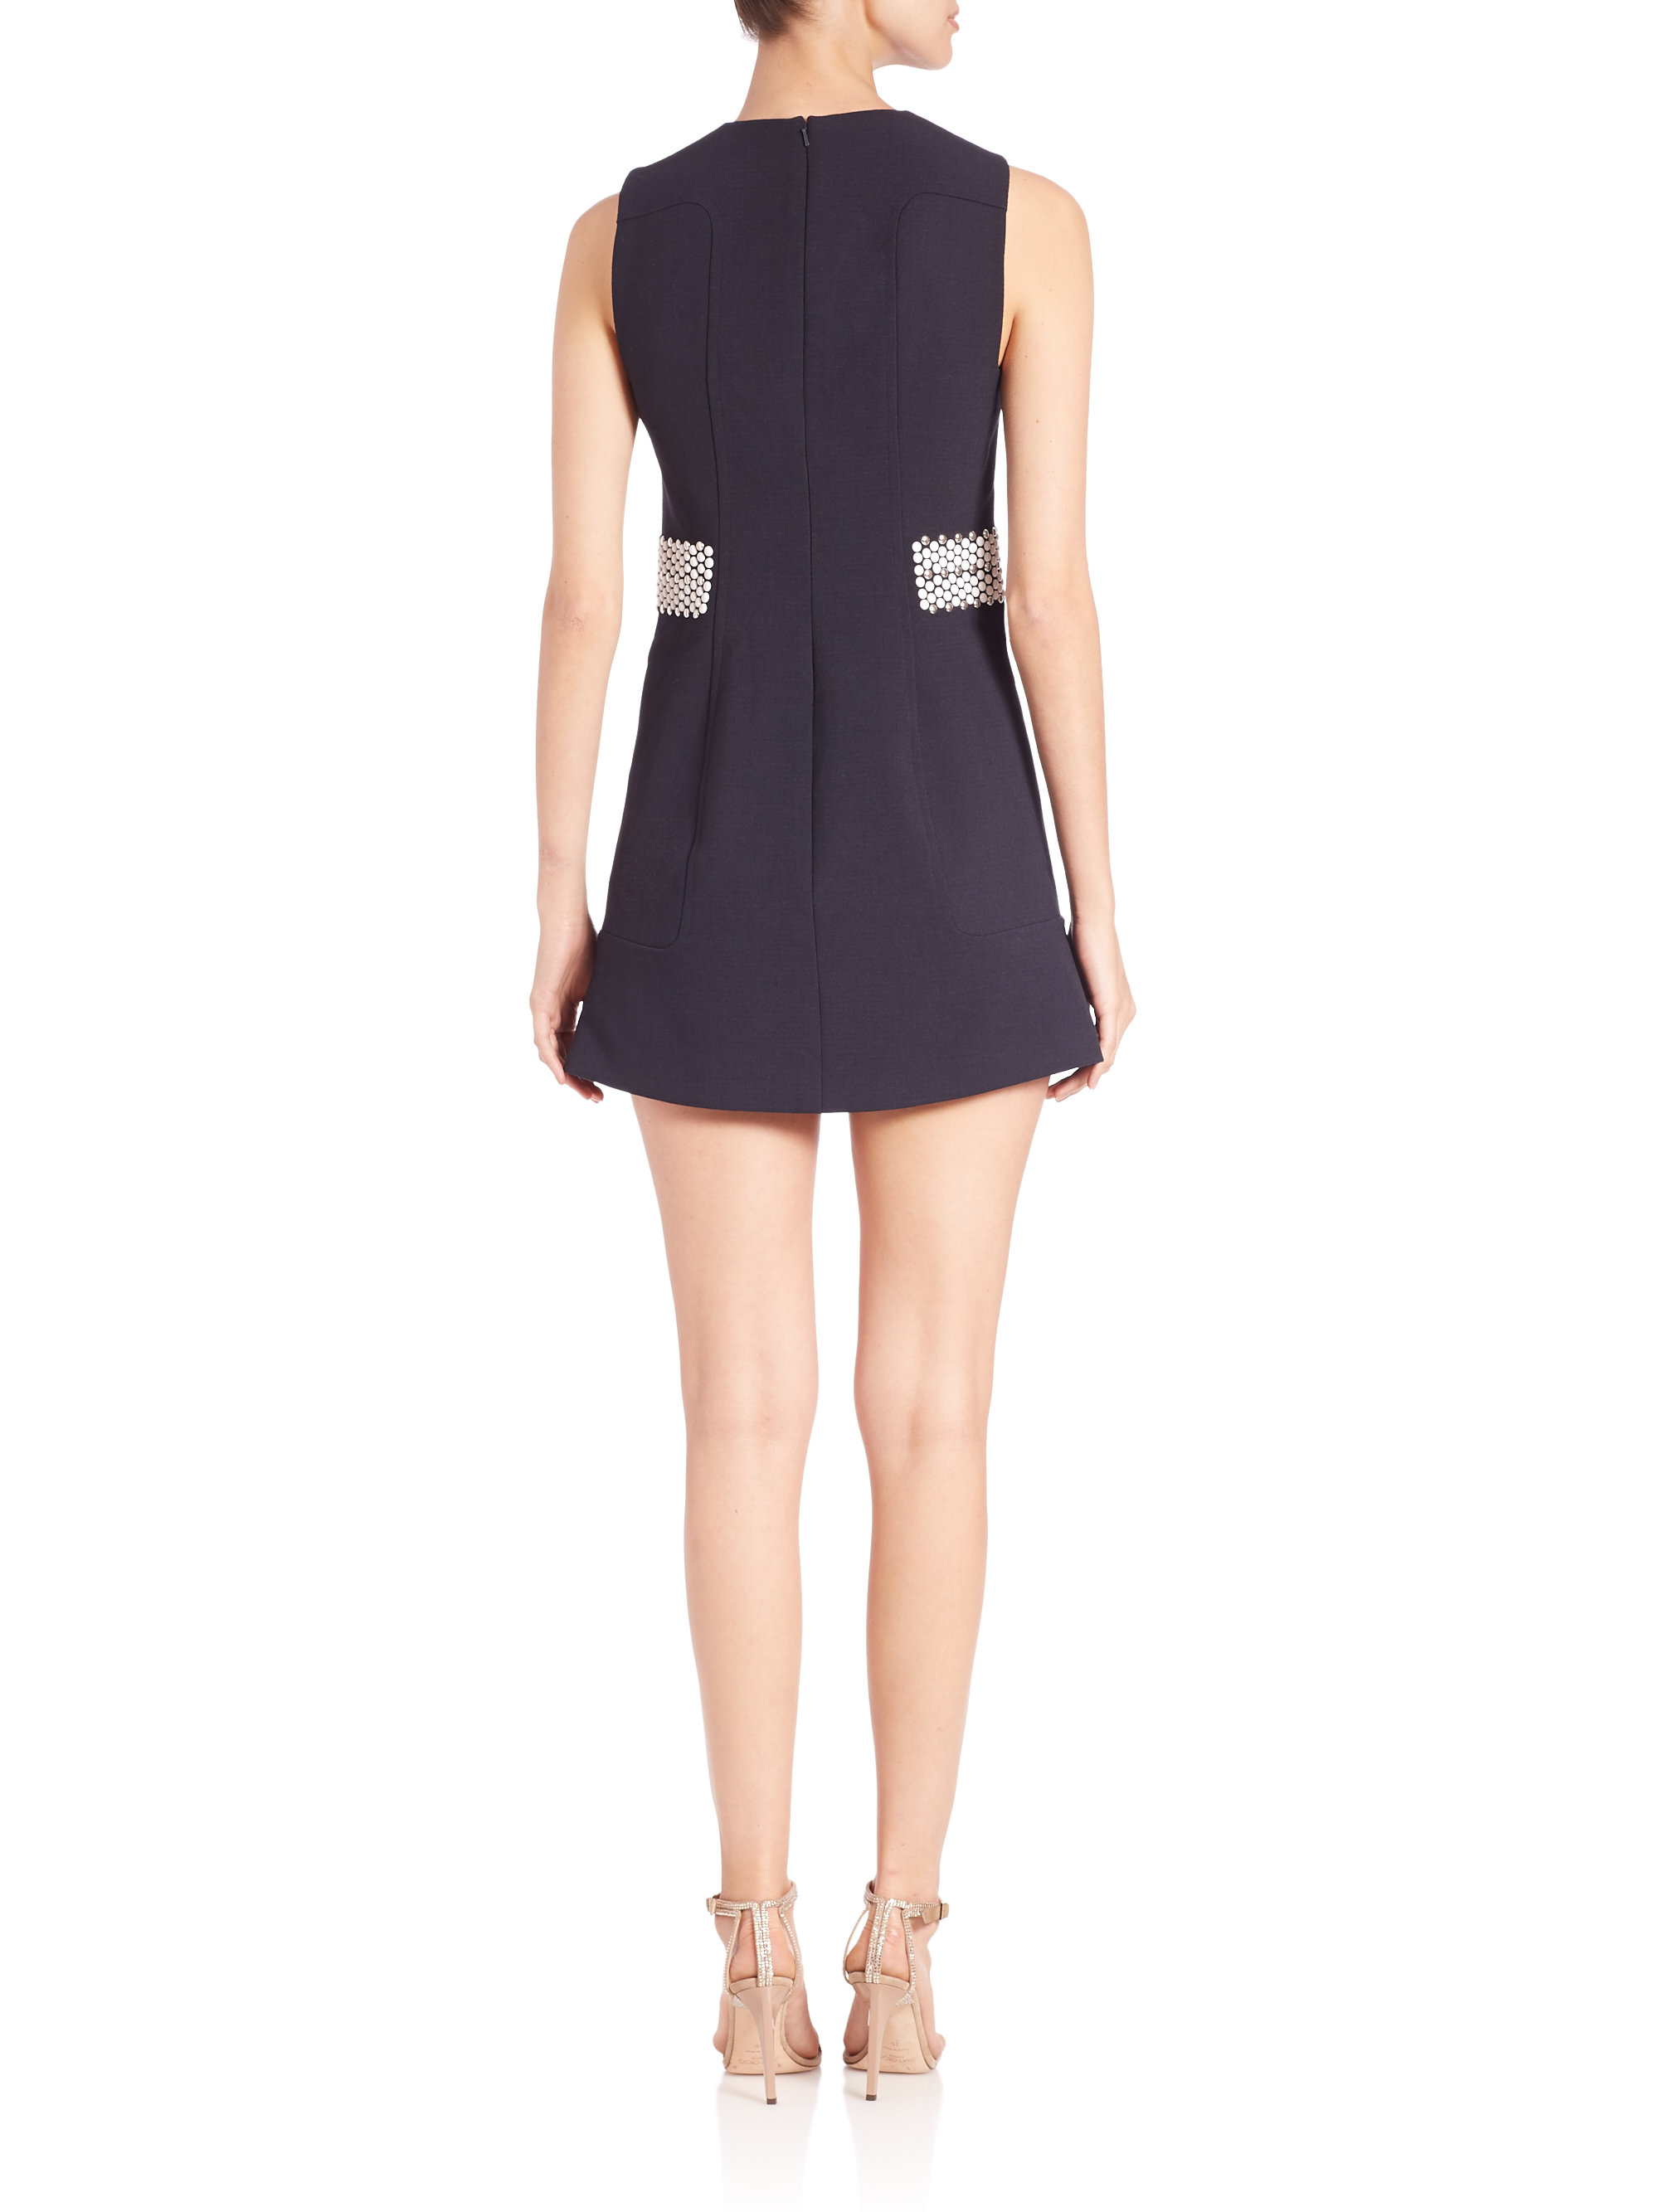 Lyst Michael Michael Kors Hot Fix Panel Dress in Blue